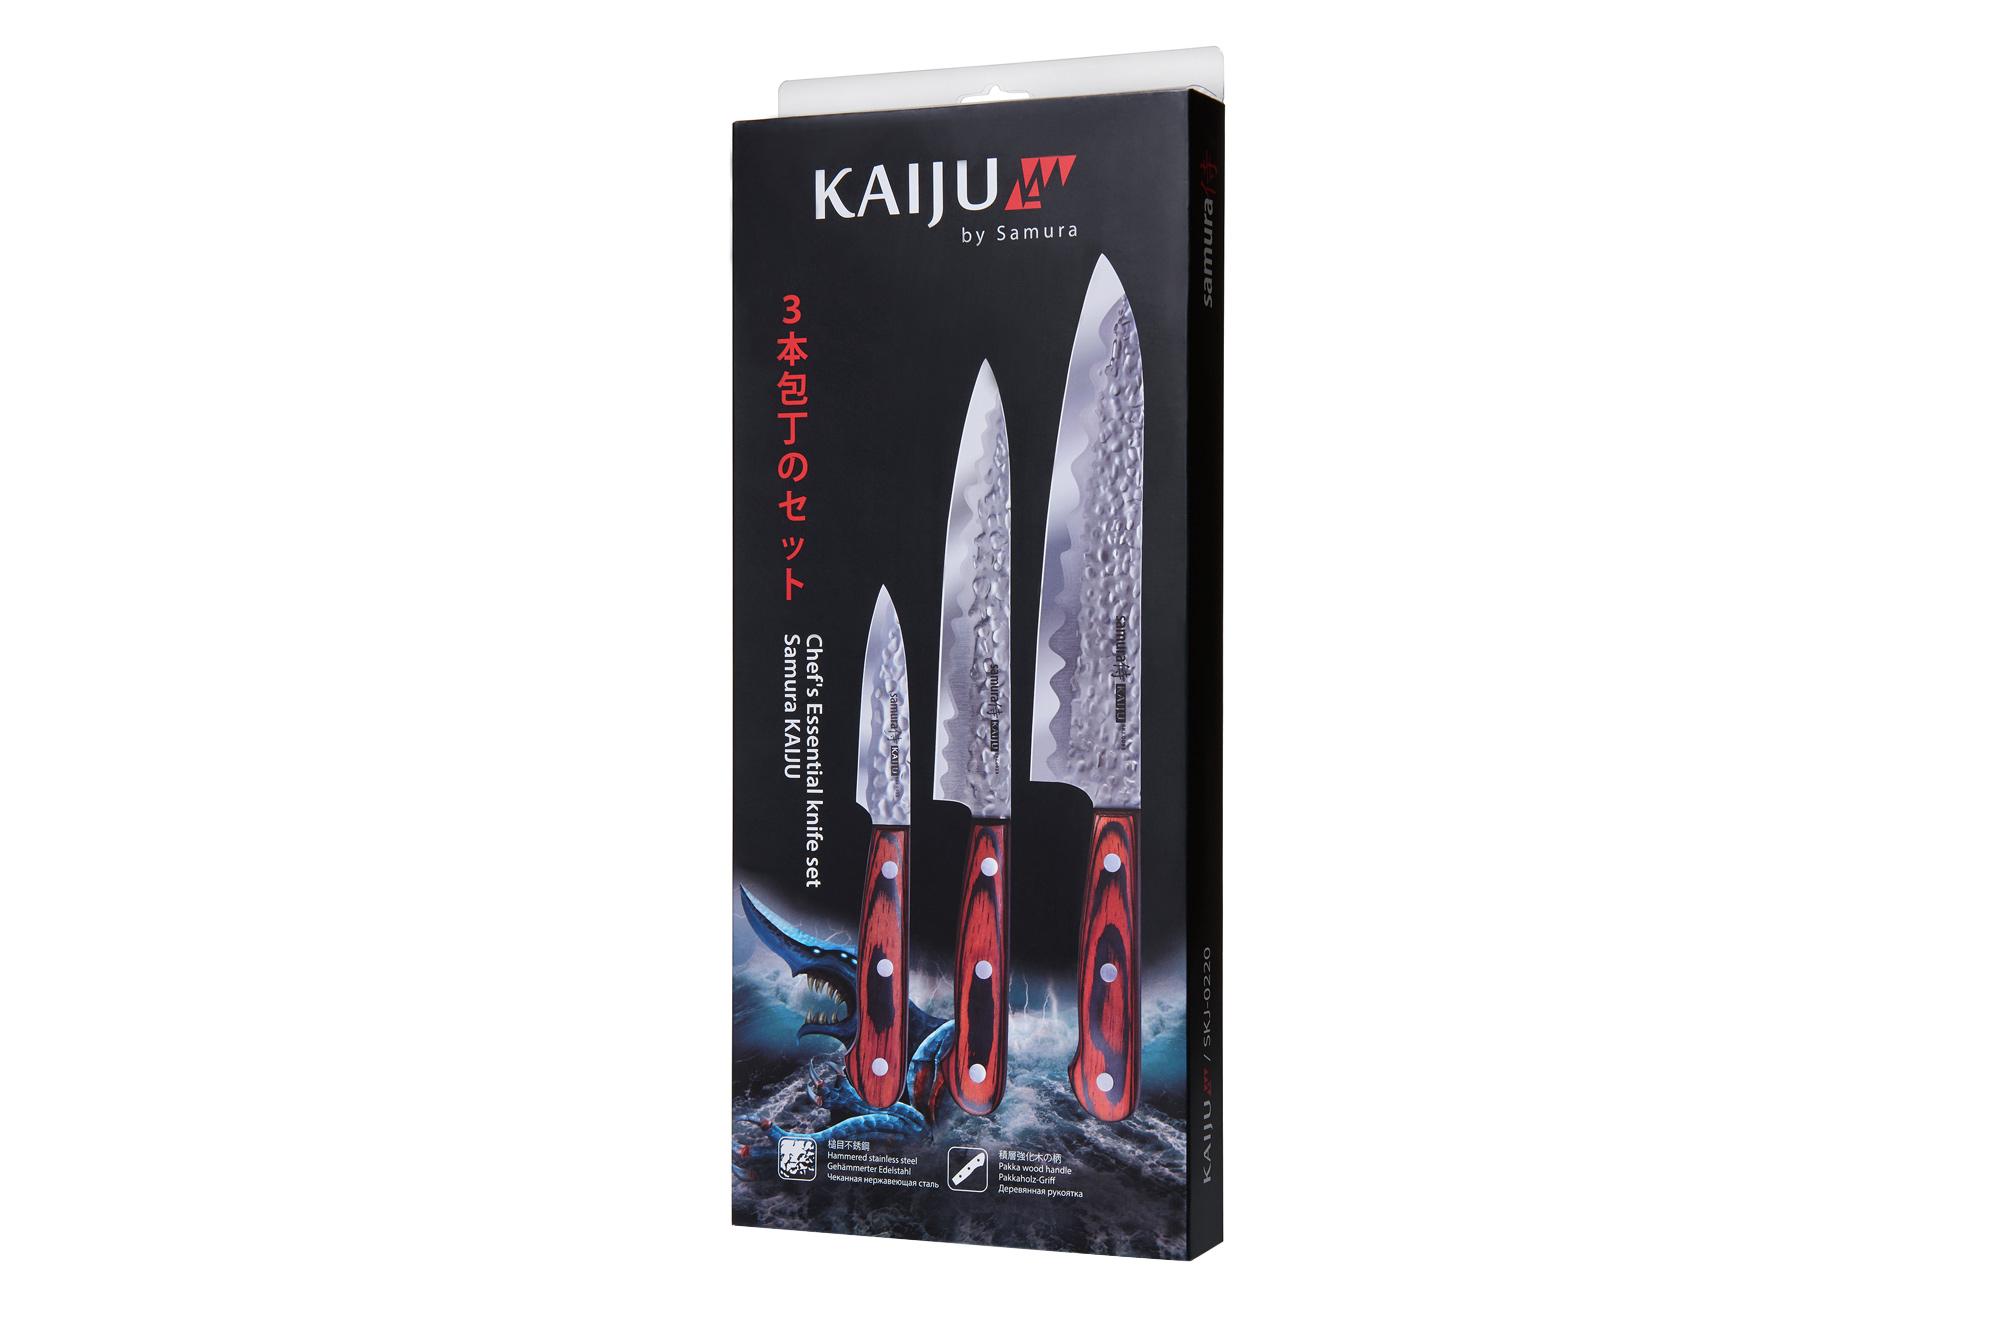 Samura Kaiju 3 noa komplekt, HRC 59